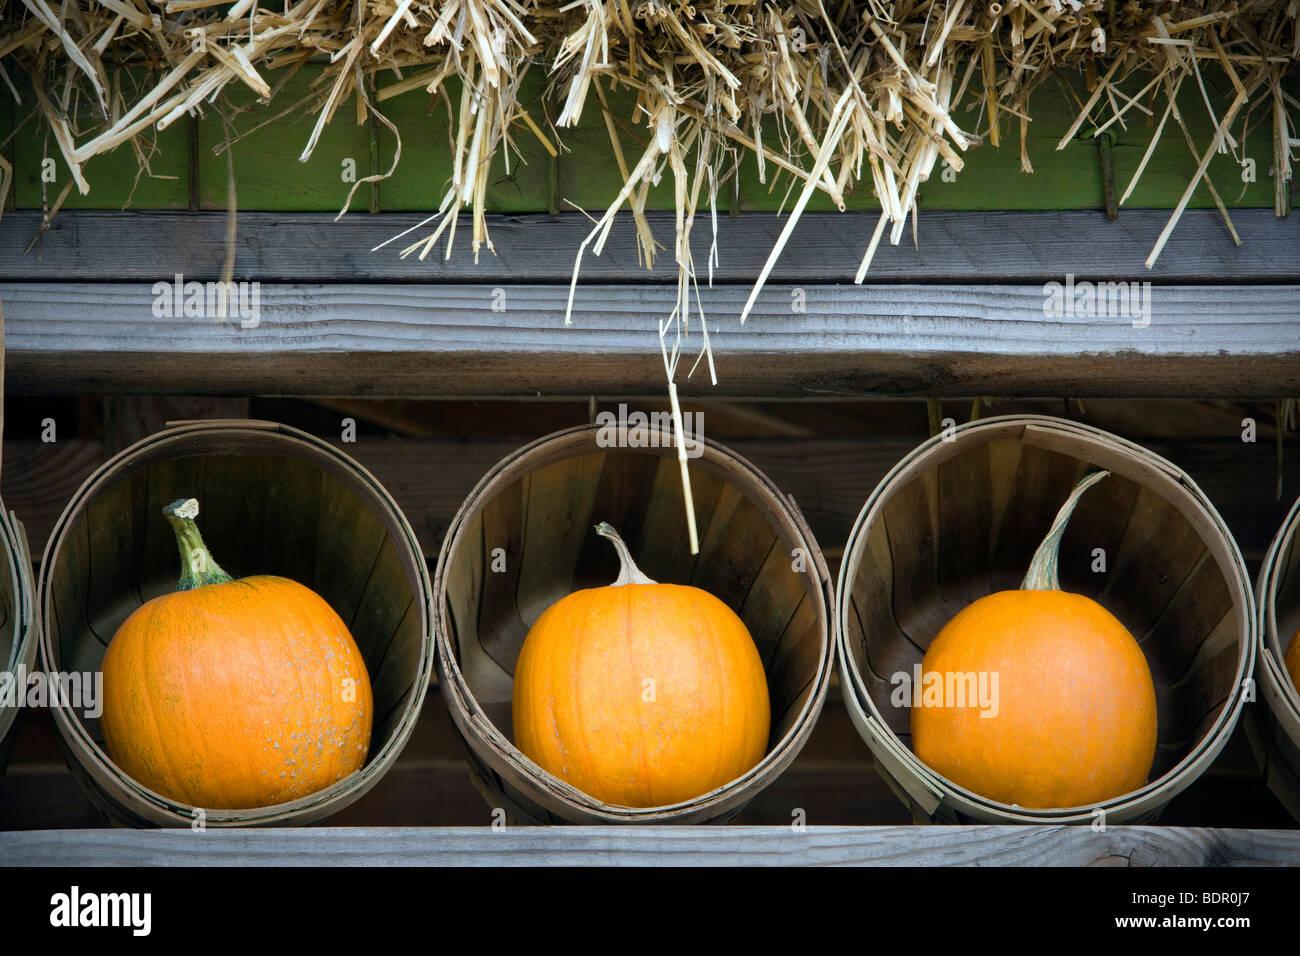 Pumpkins in baskets. Al's Garden Nursery, Oregon - Stock Image